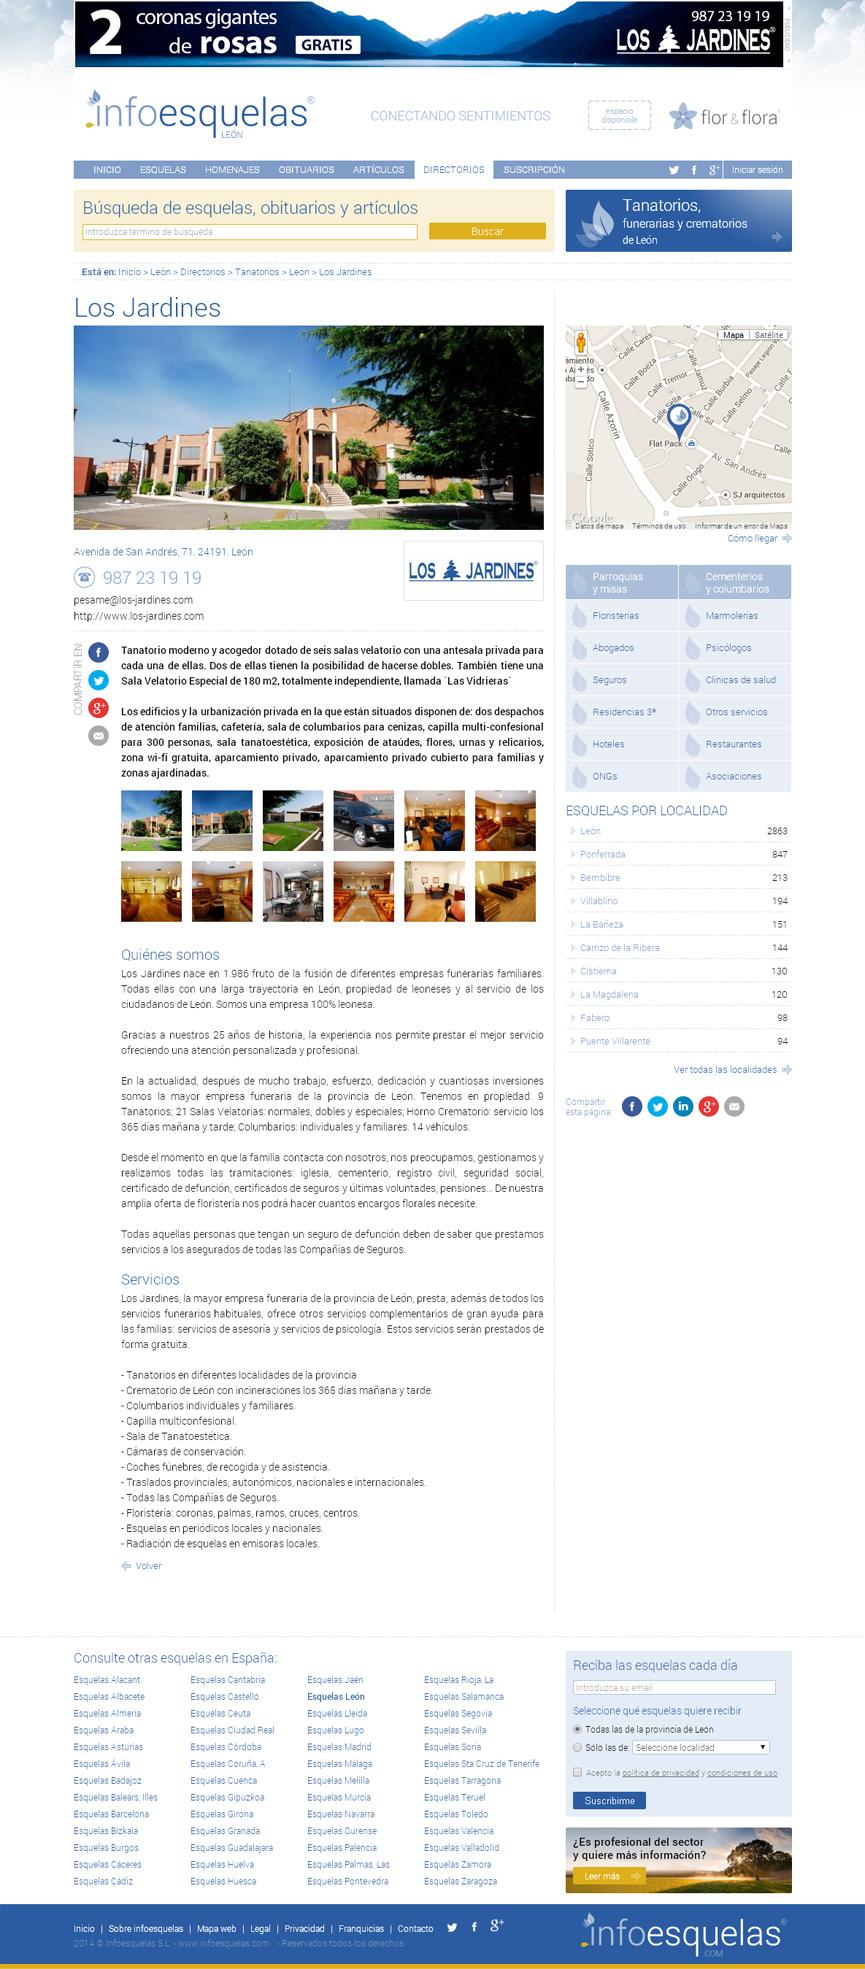 Infoesquelas_info8